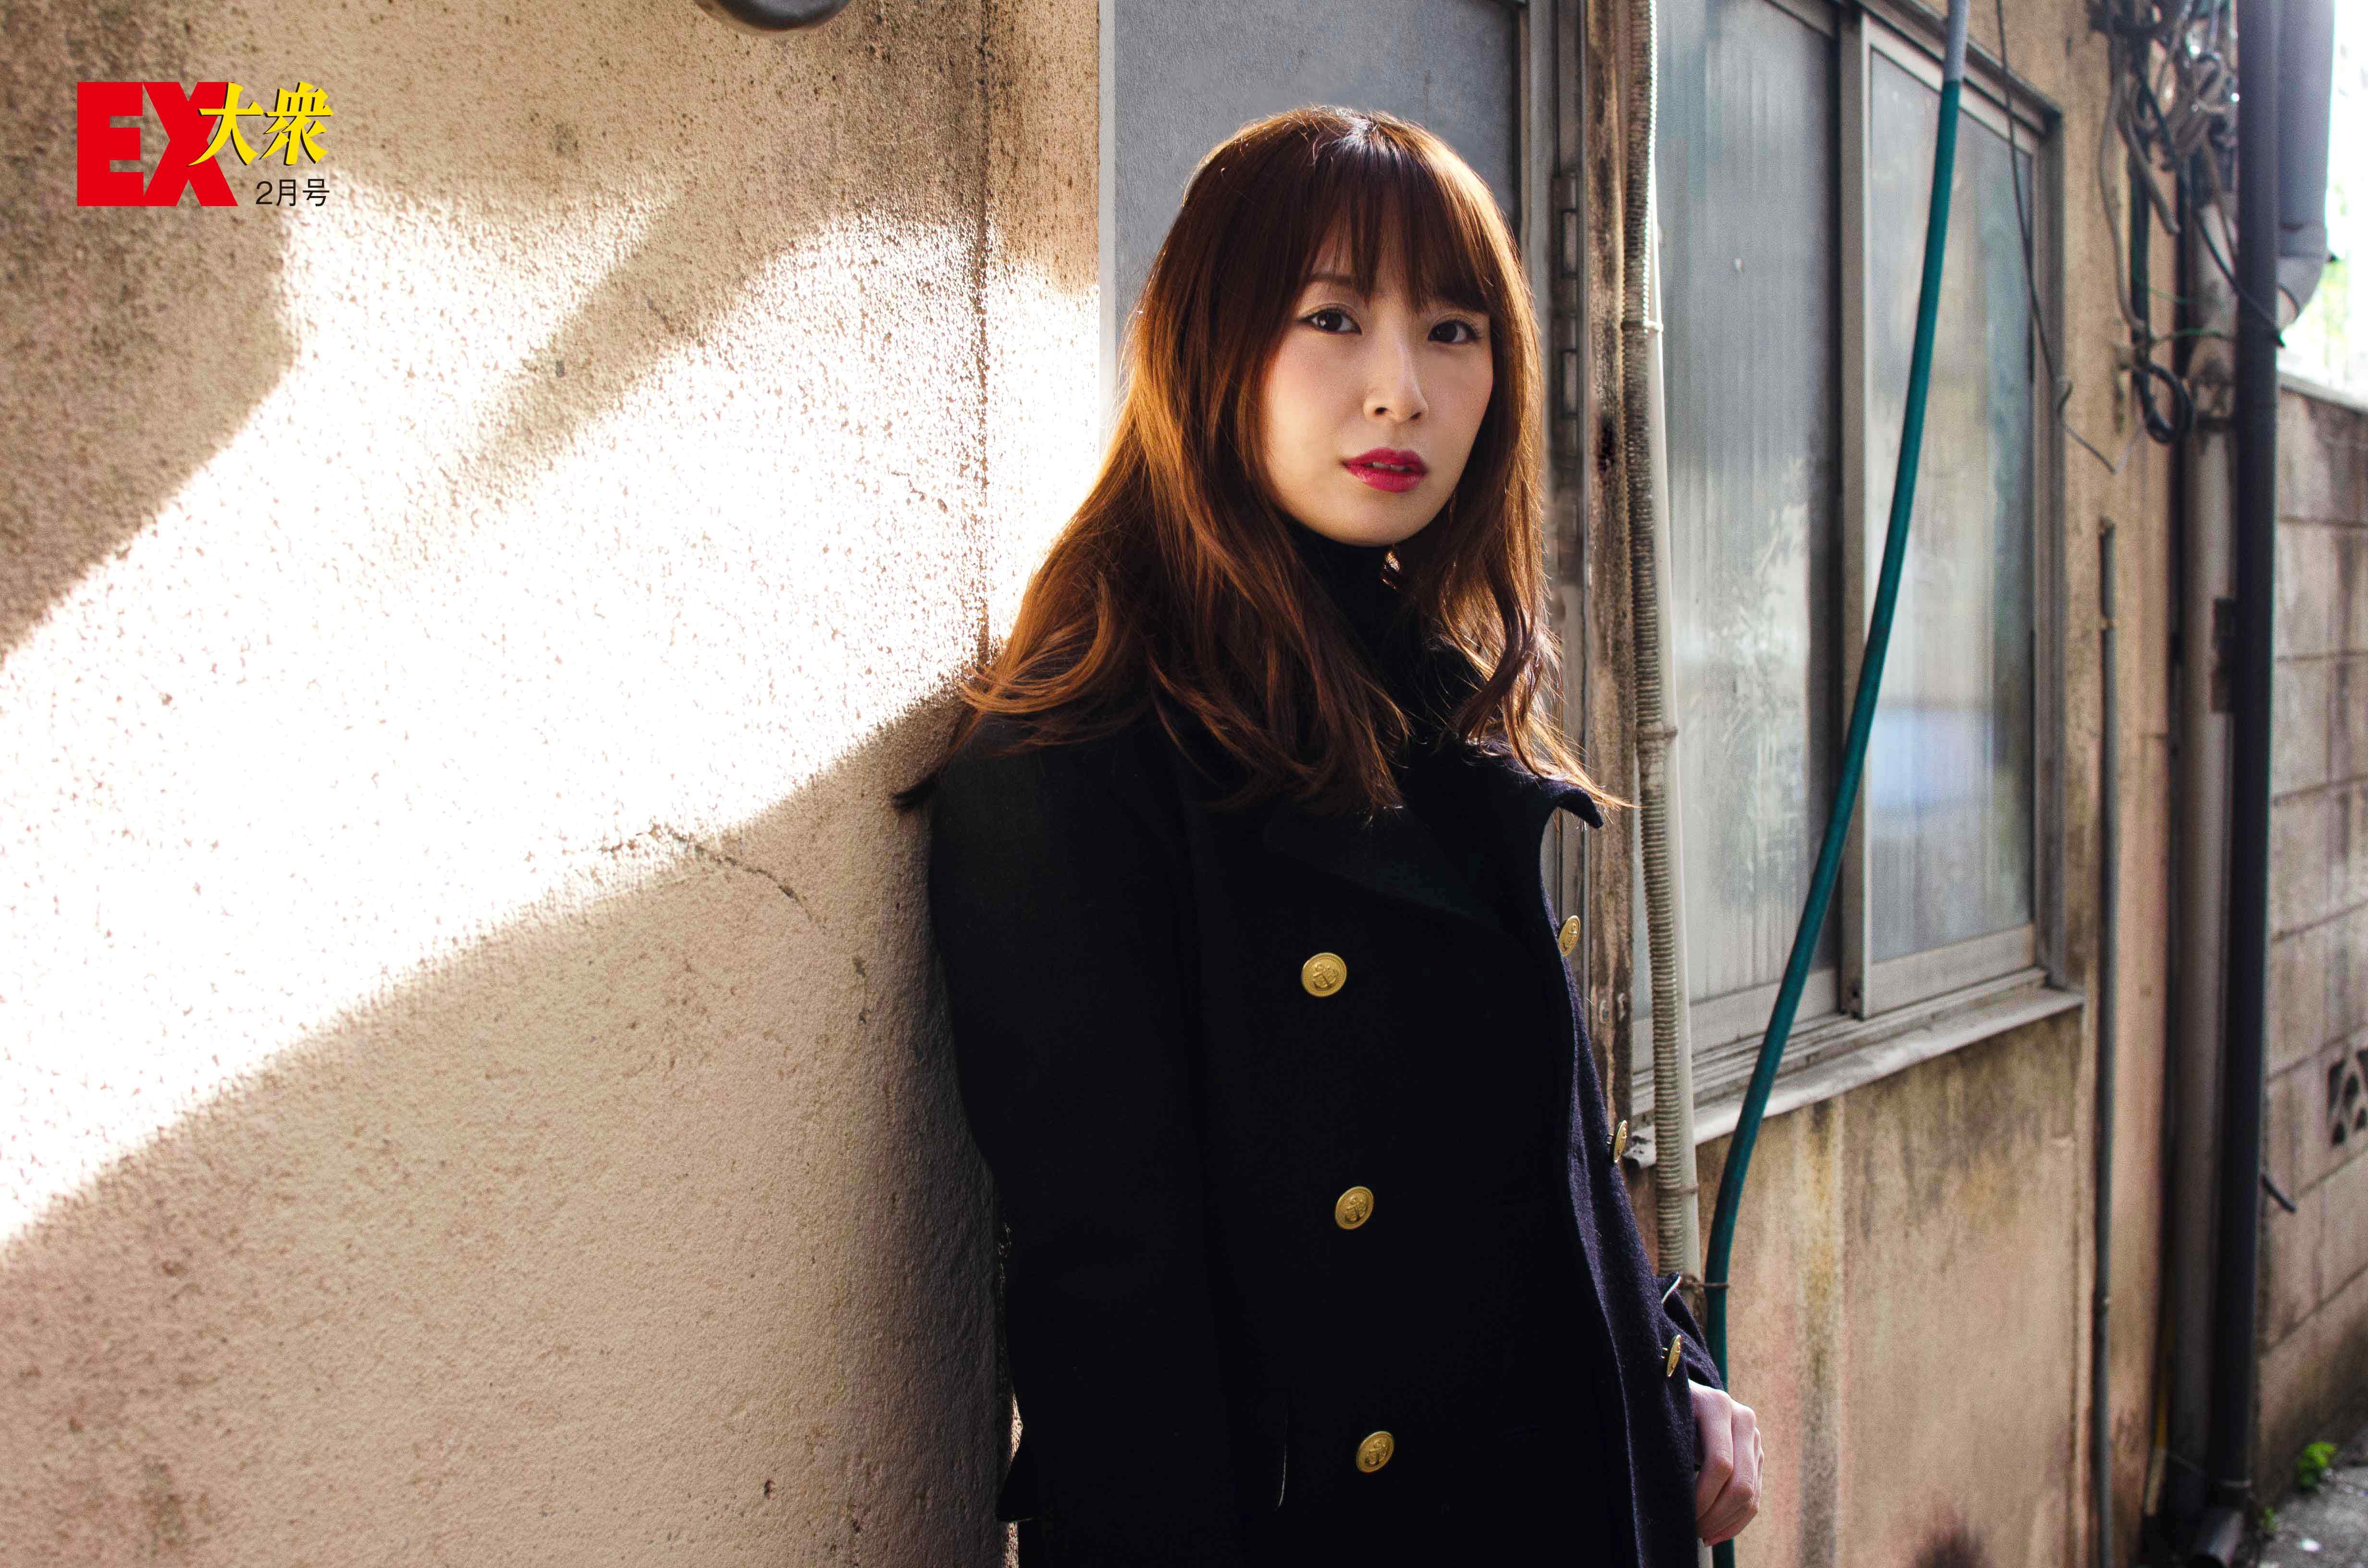 SKE48高柳明音の本誌未掲載カット5枚を大公開!【EX大衆2月号】の画像001